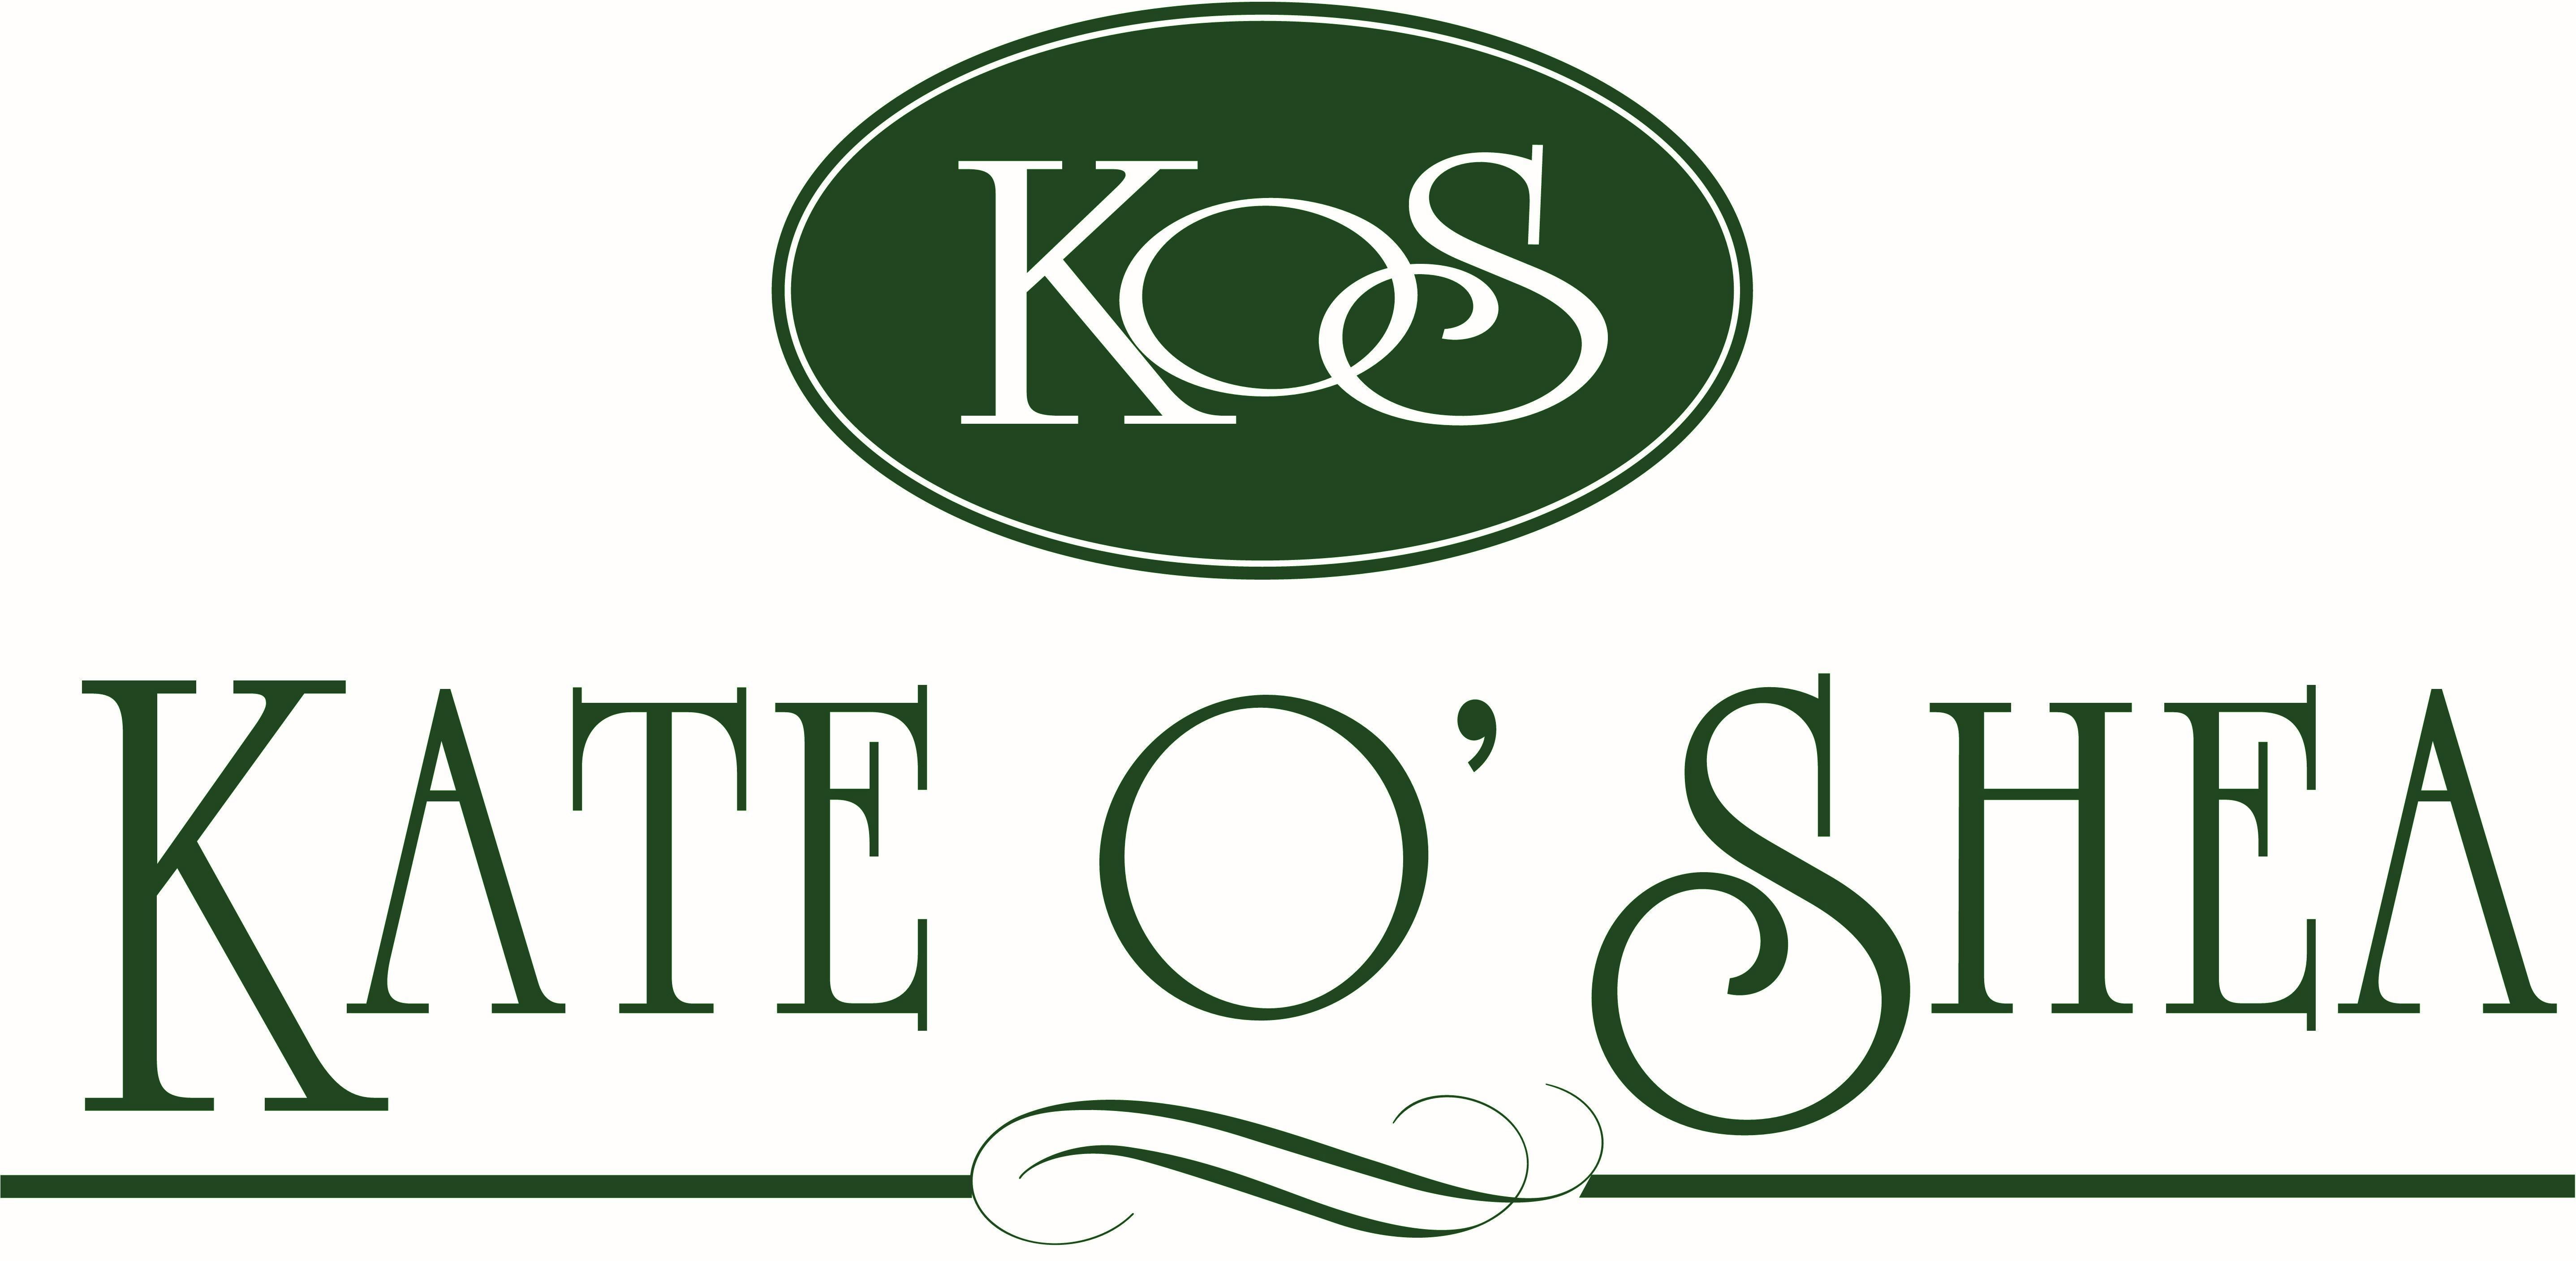 Kate O' Shea Auctioneers